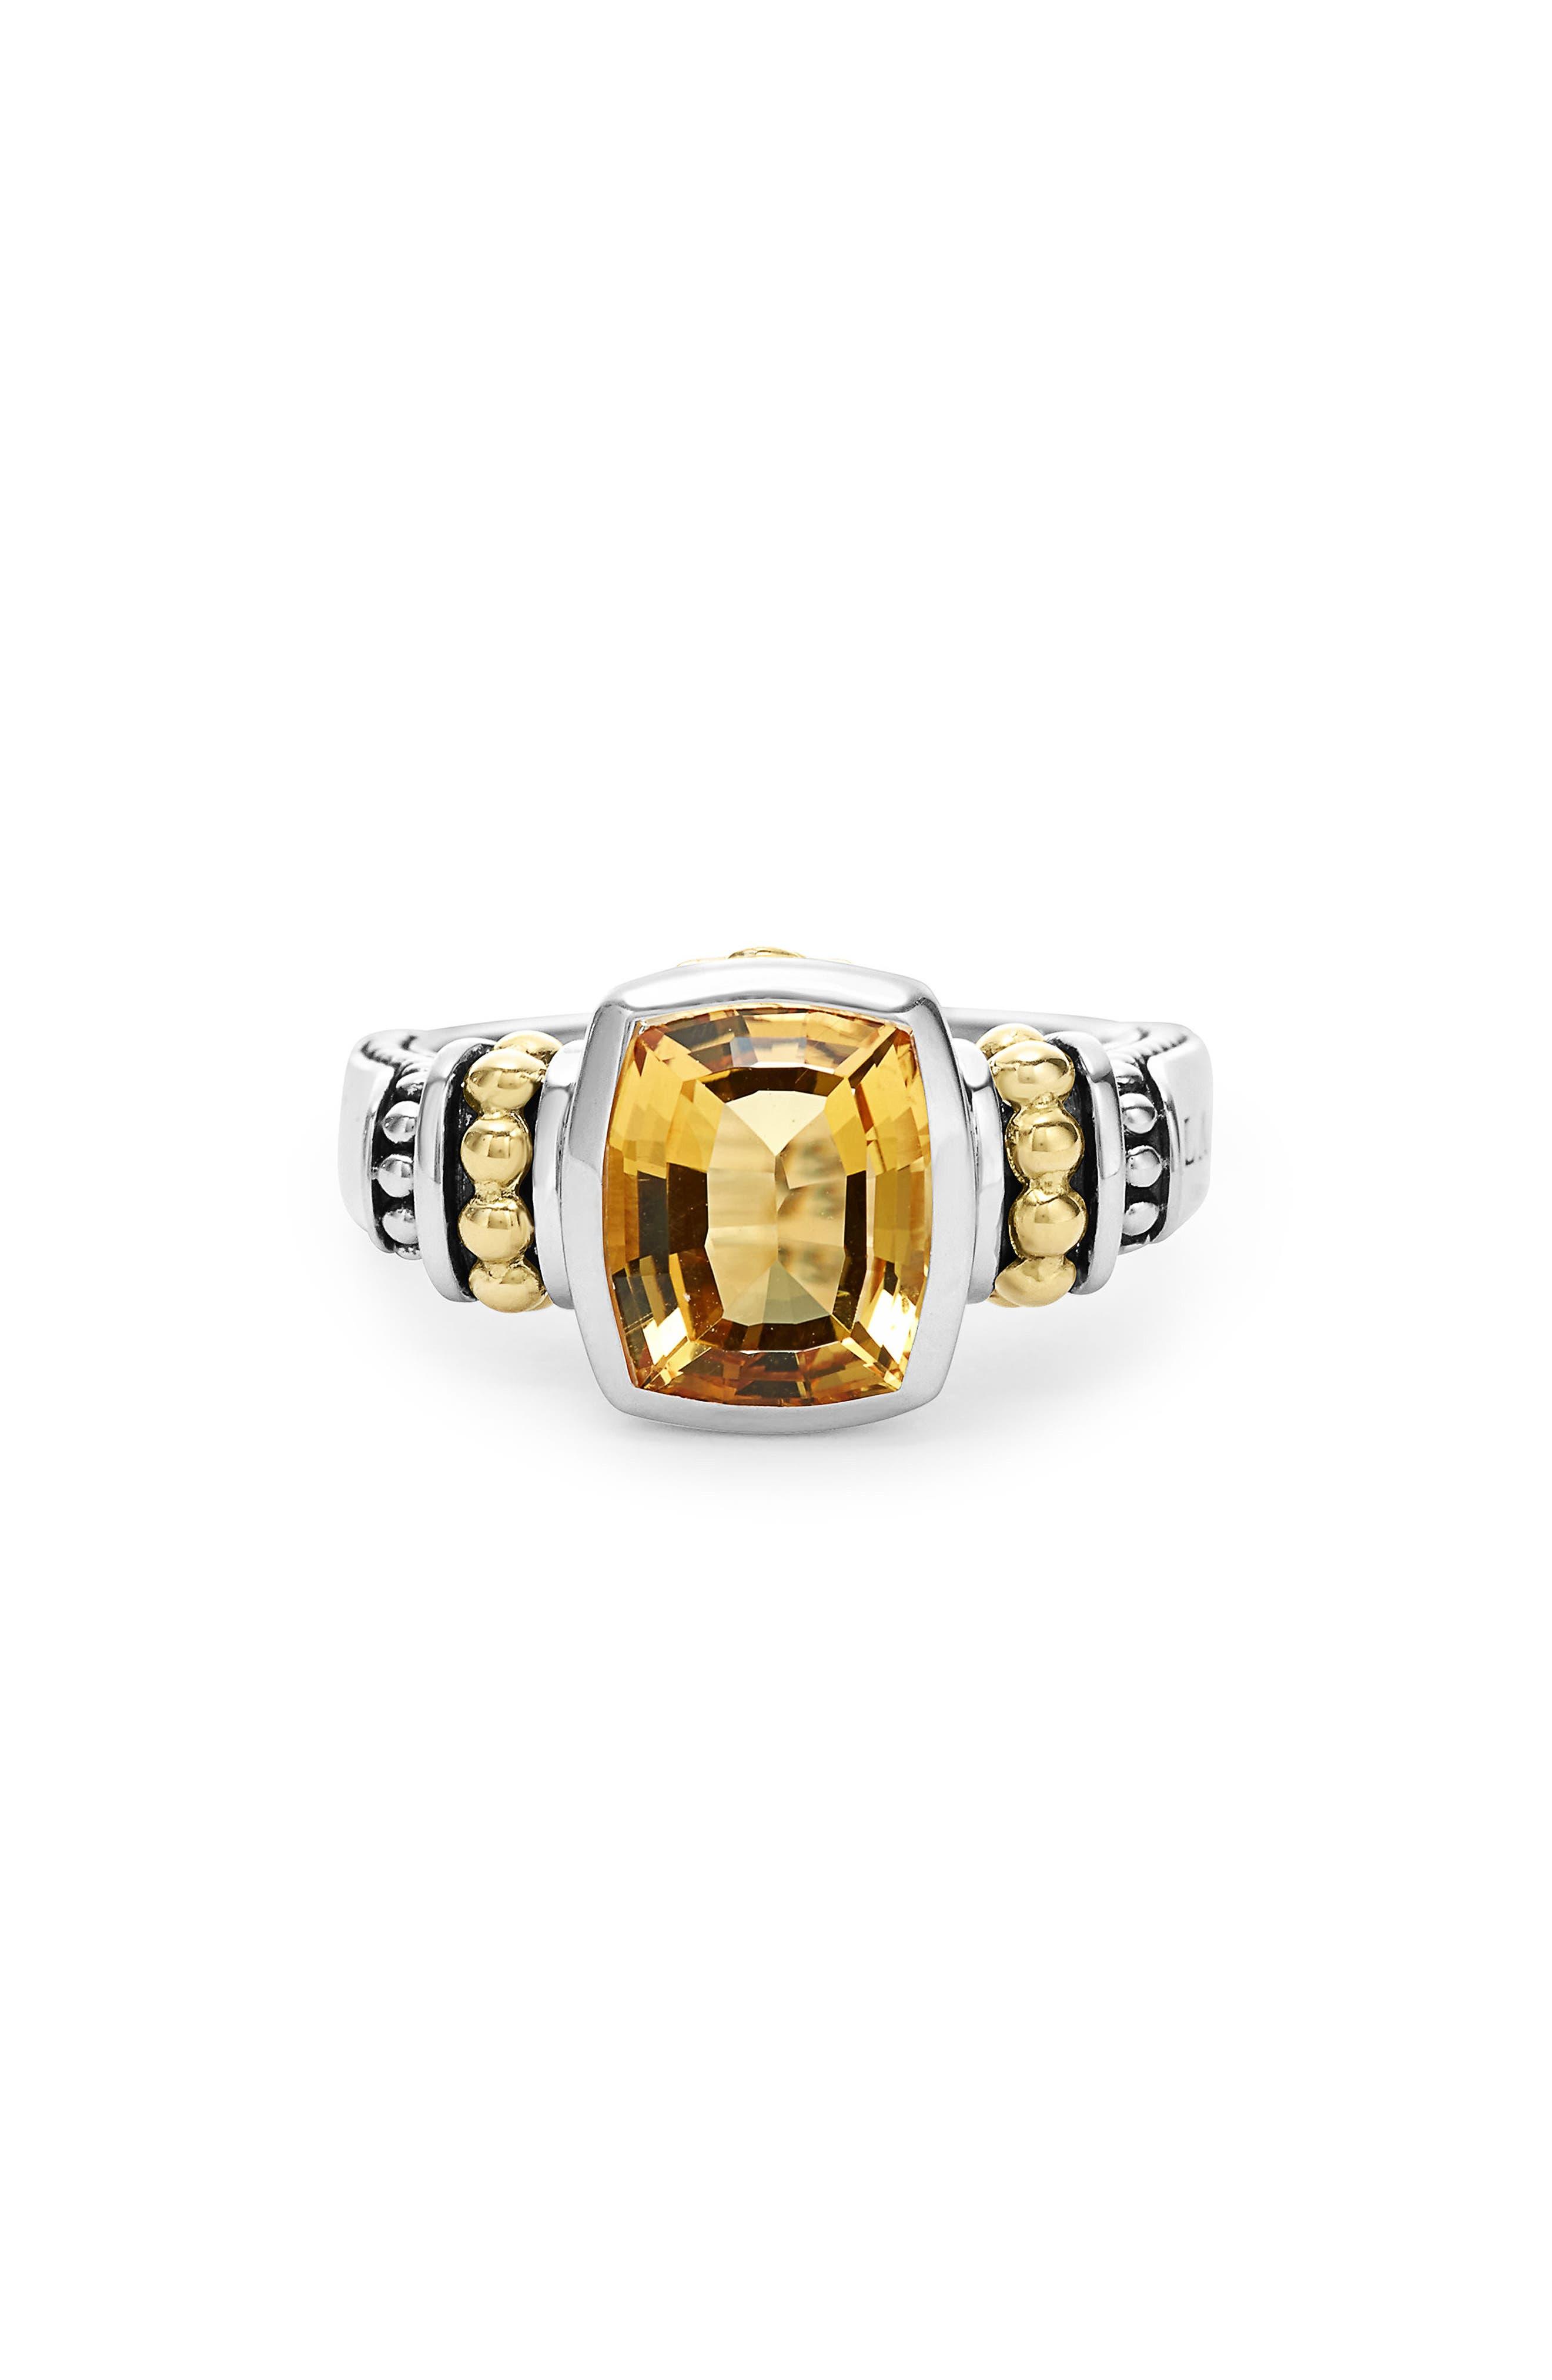 Alternate Image 1 Selected - LAGOS 'Caviar Color' Small Semiprecious Stone Ring